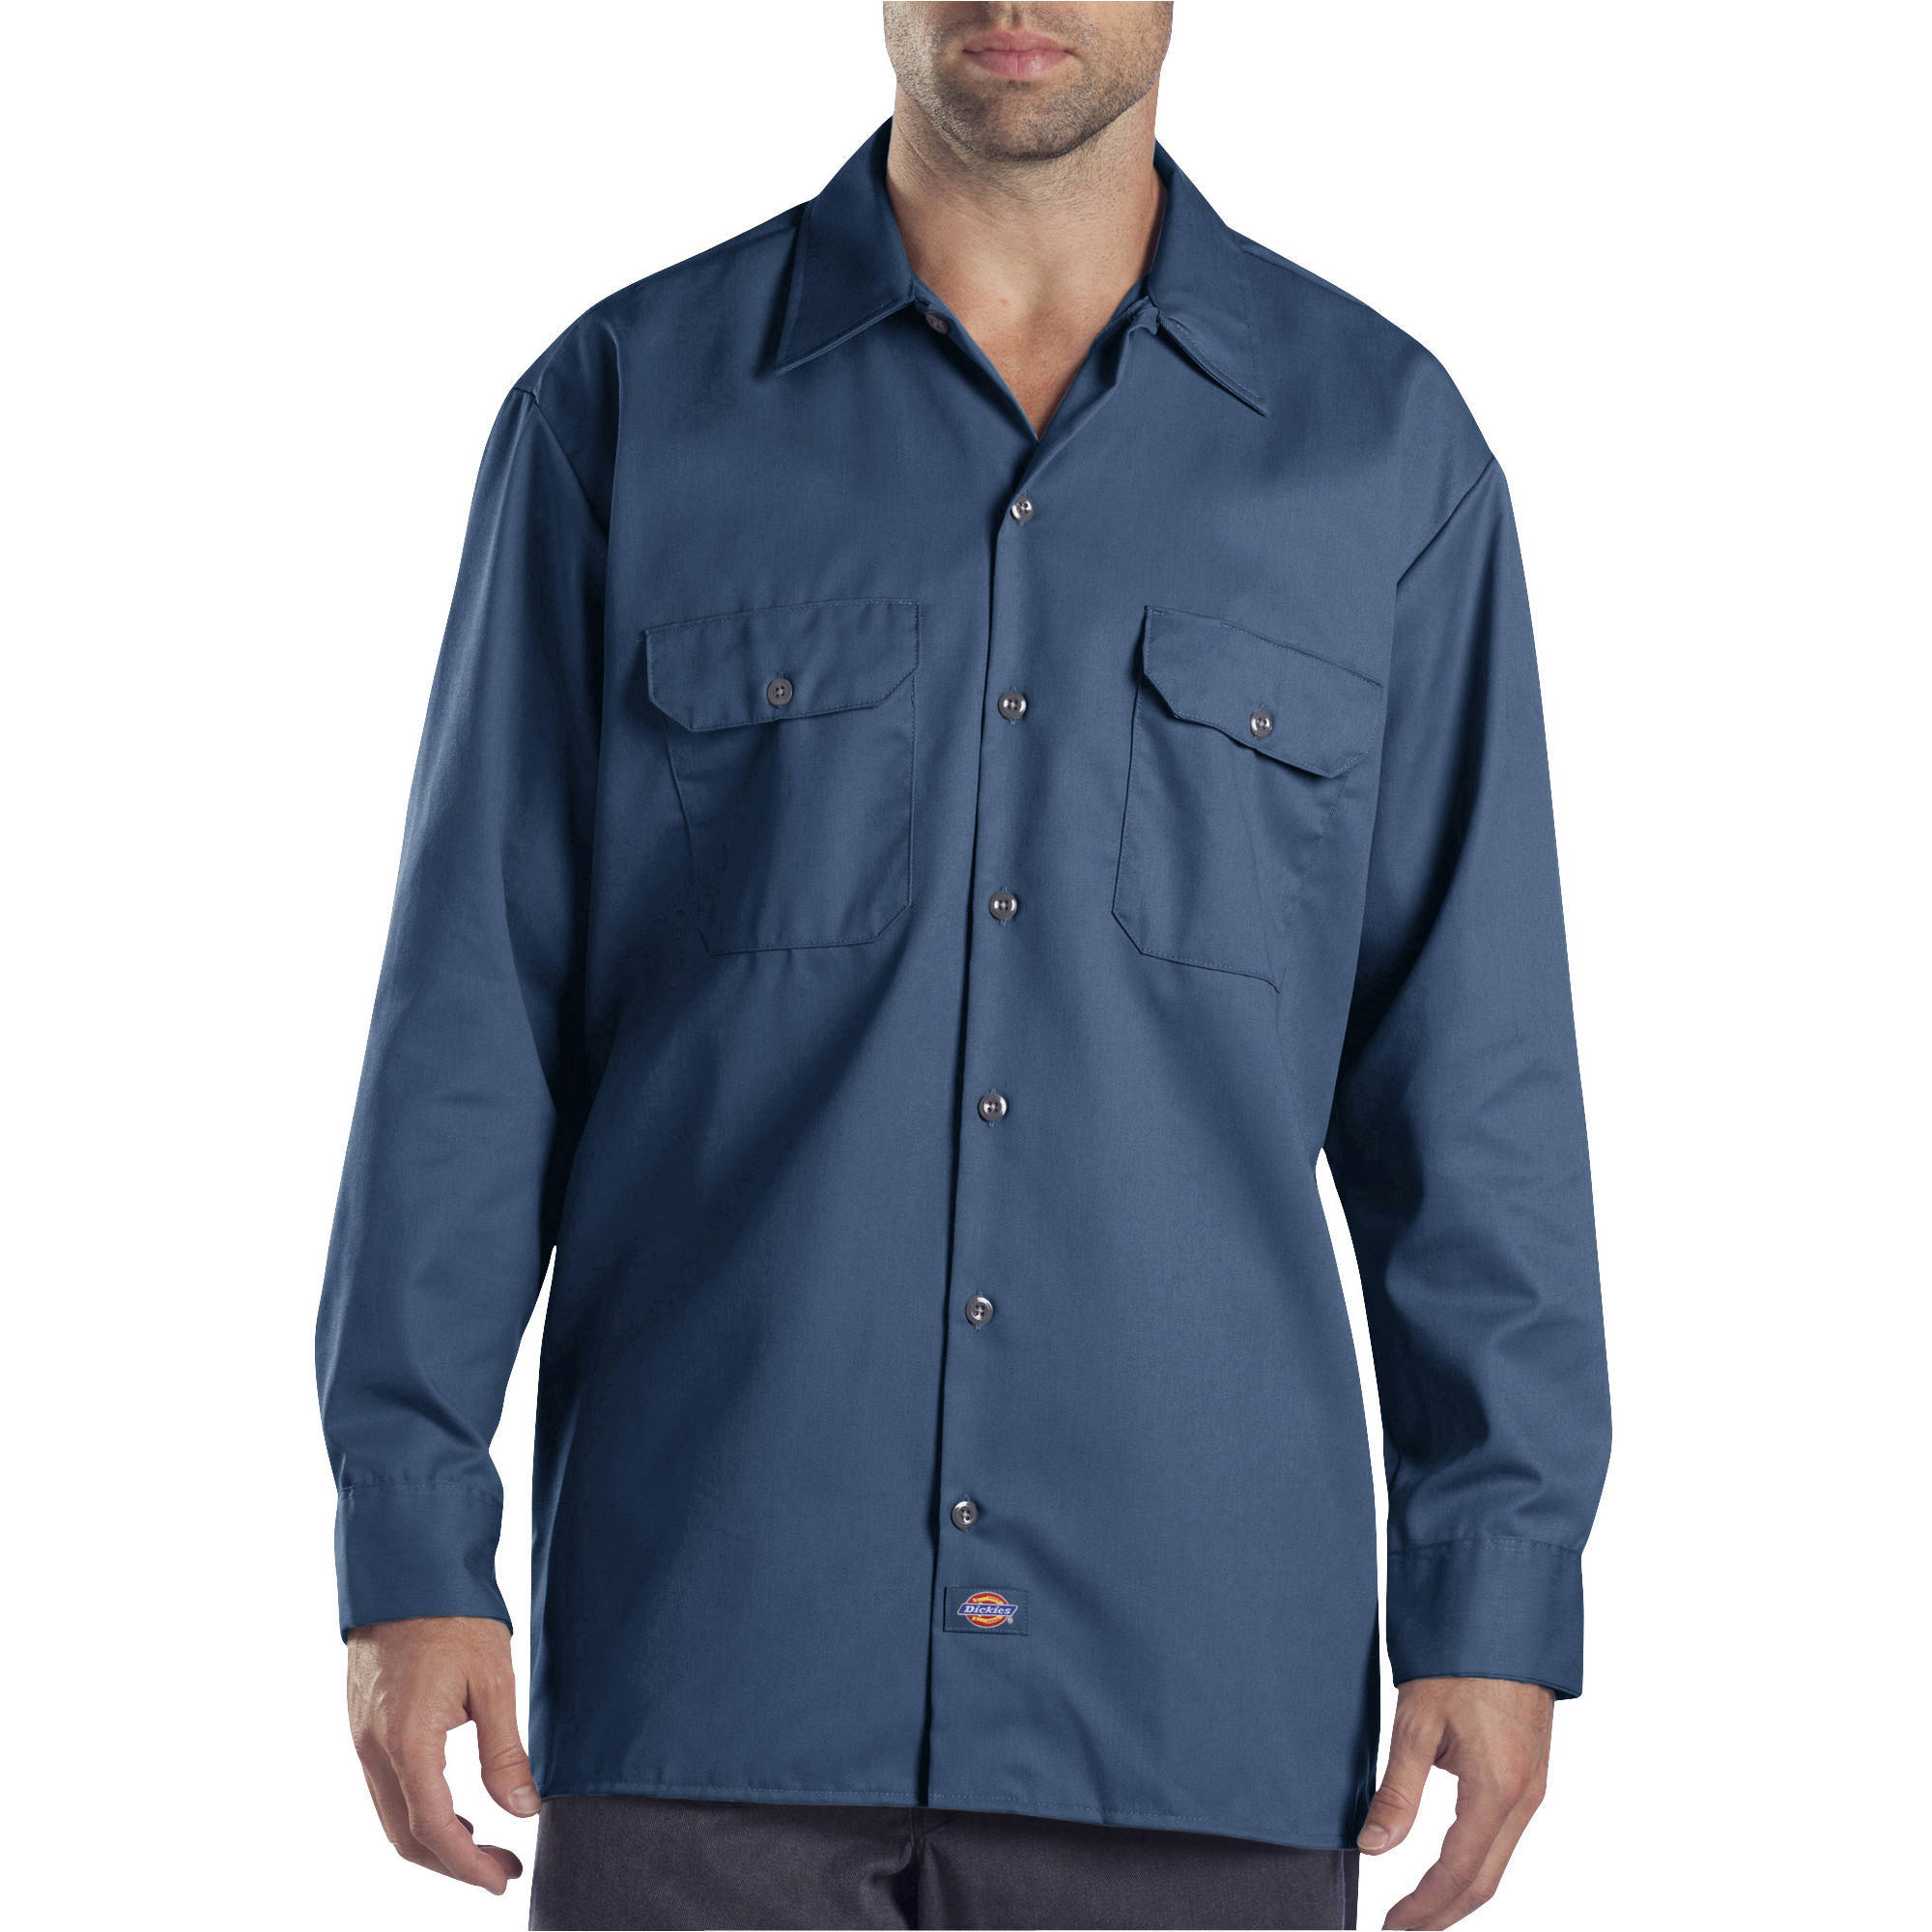 Men\'s Slim Fit Long Sleeve Solid Poplin Dress Shirt - Walmart.com